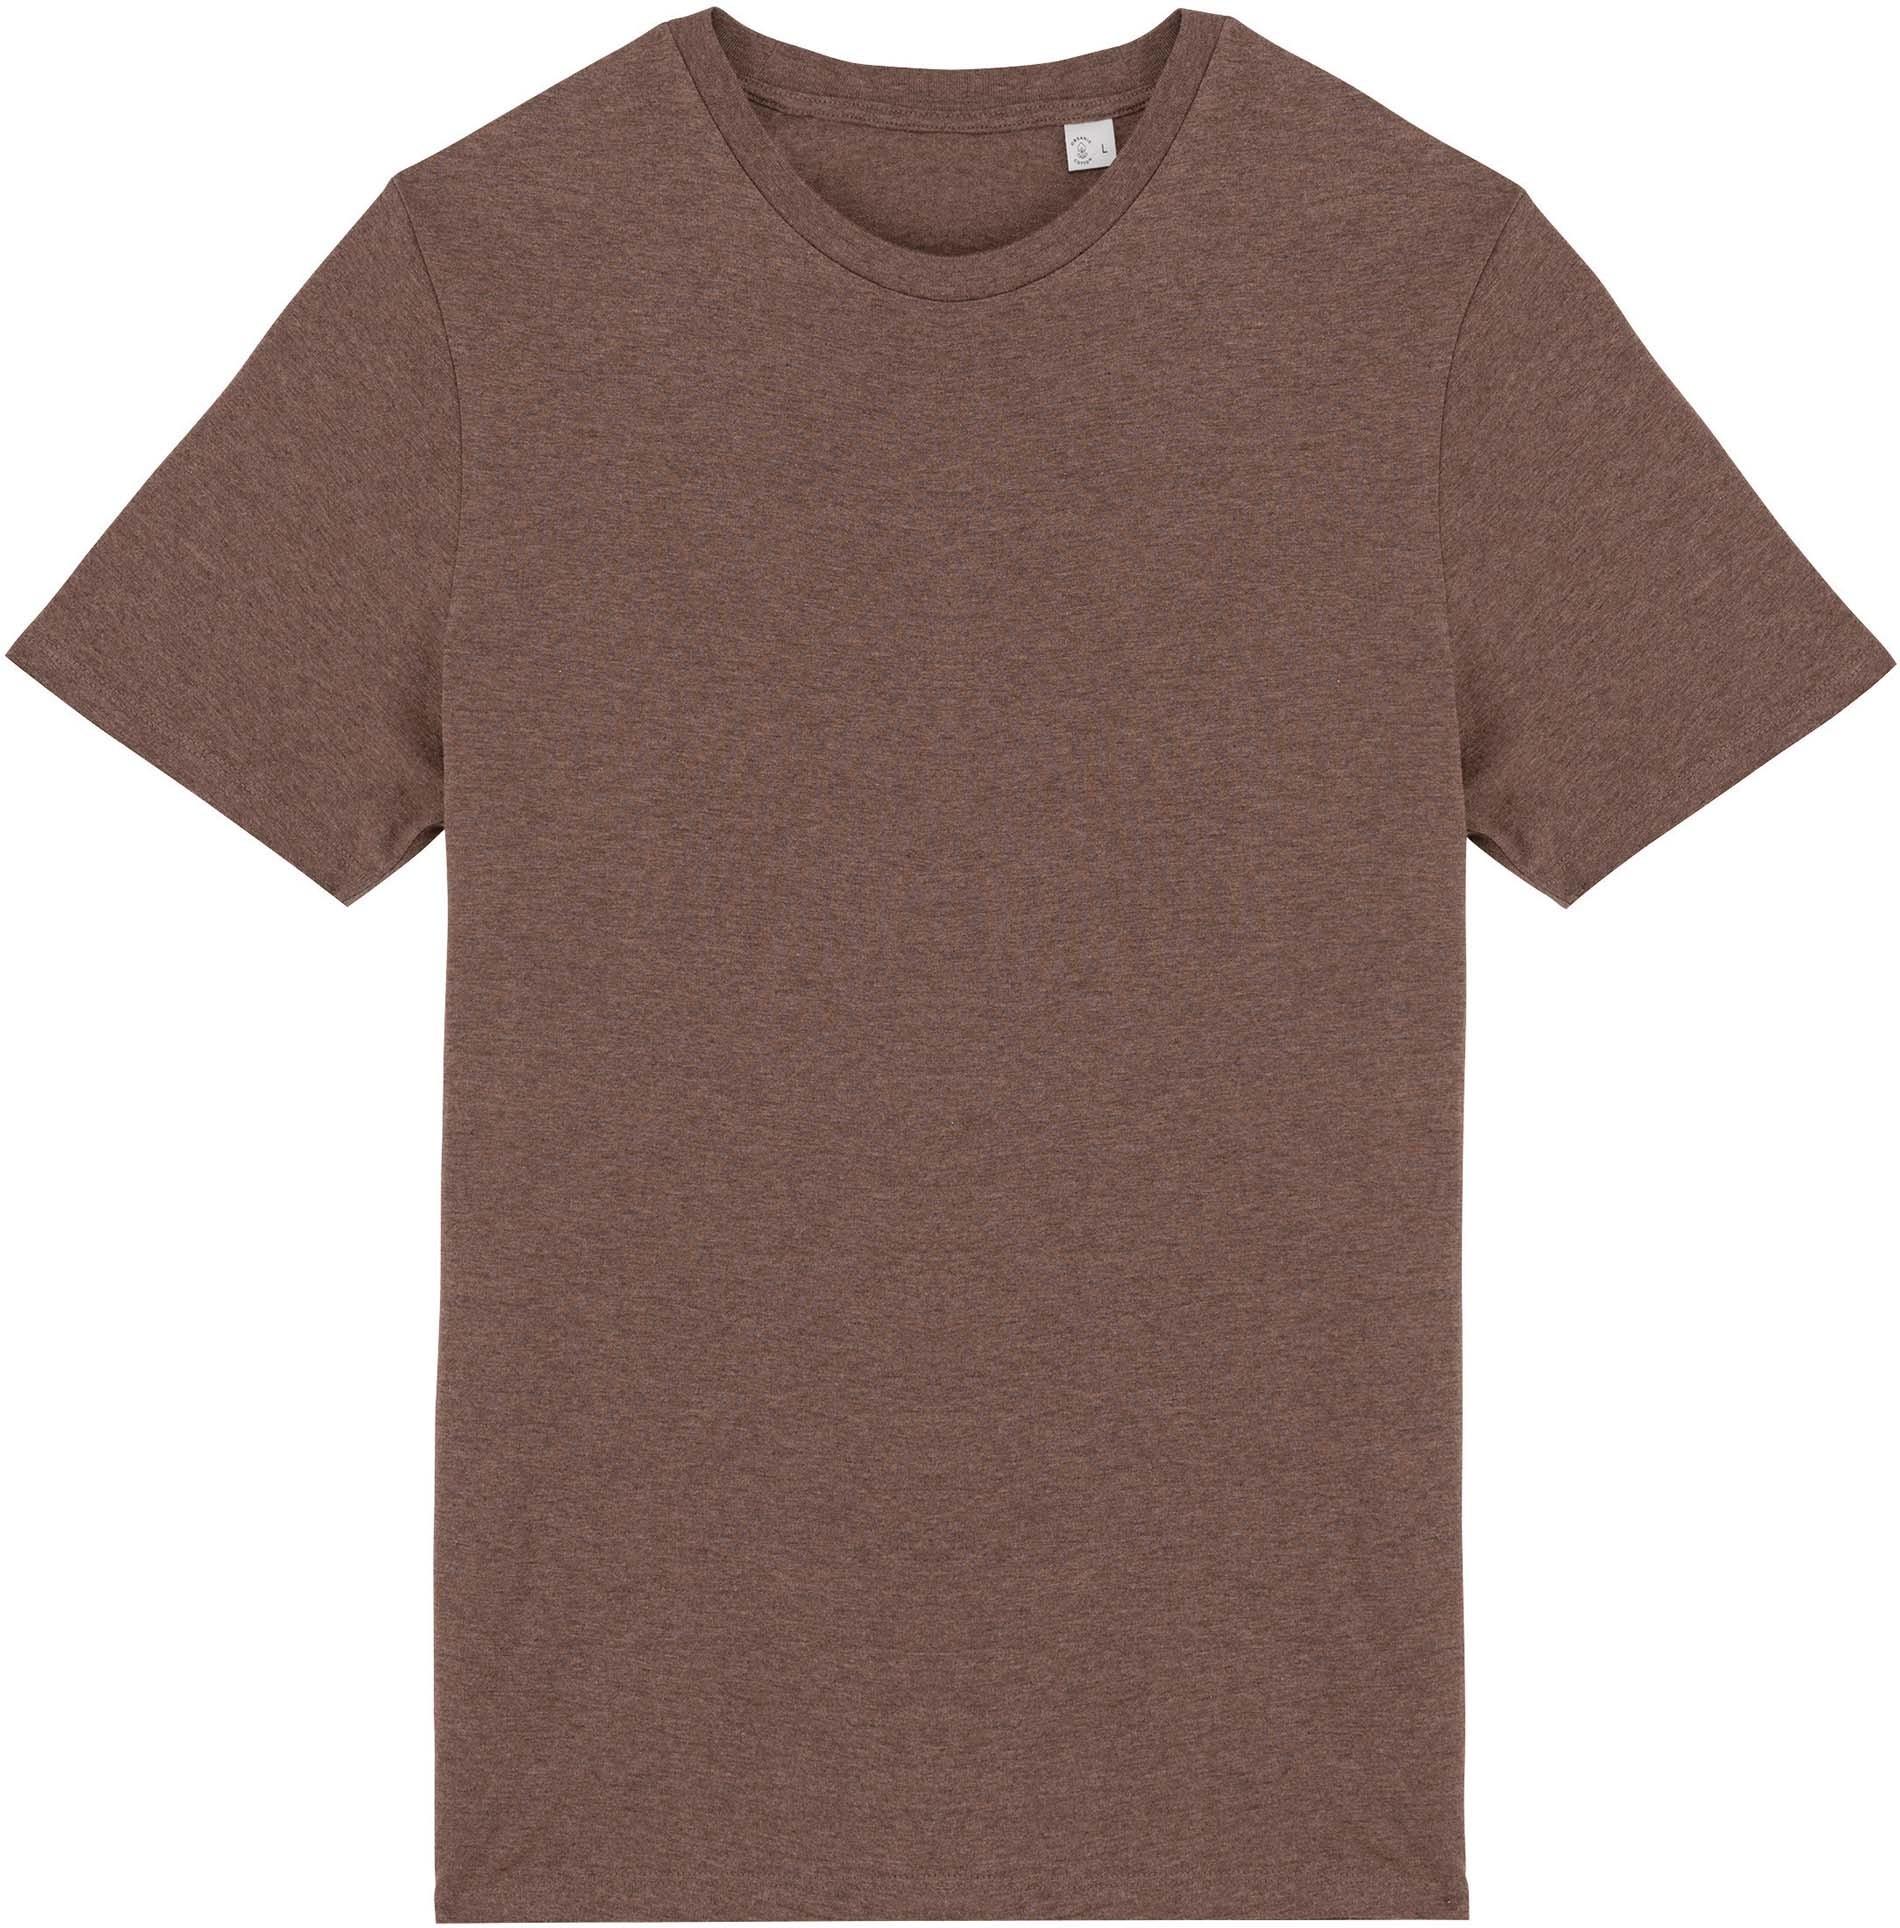 Tee-shirt manches courtes unisexe - 2-1843-20